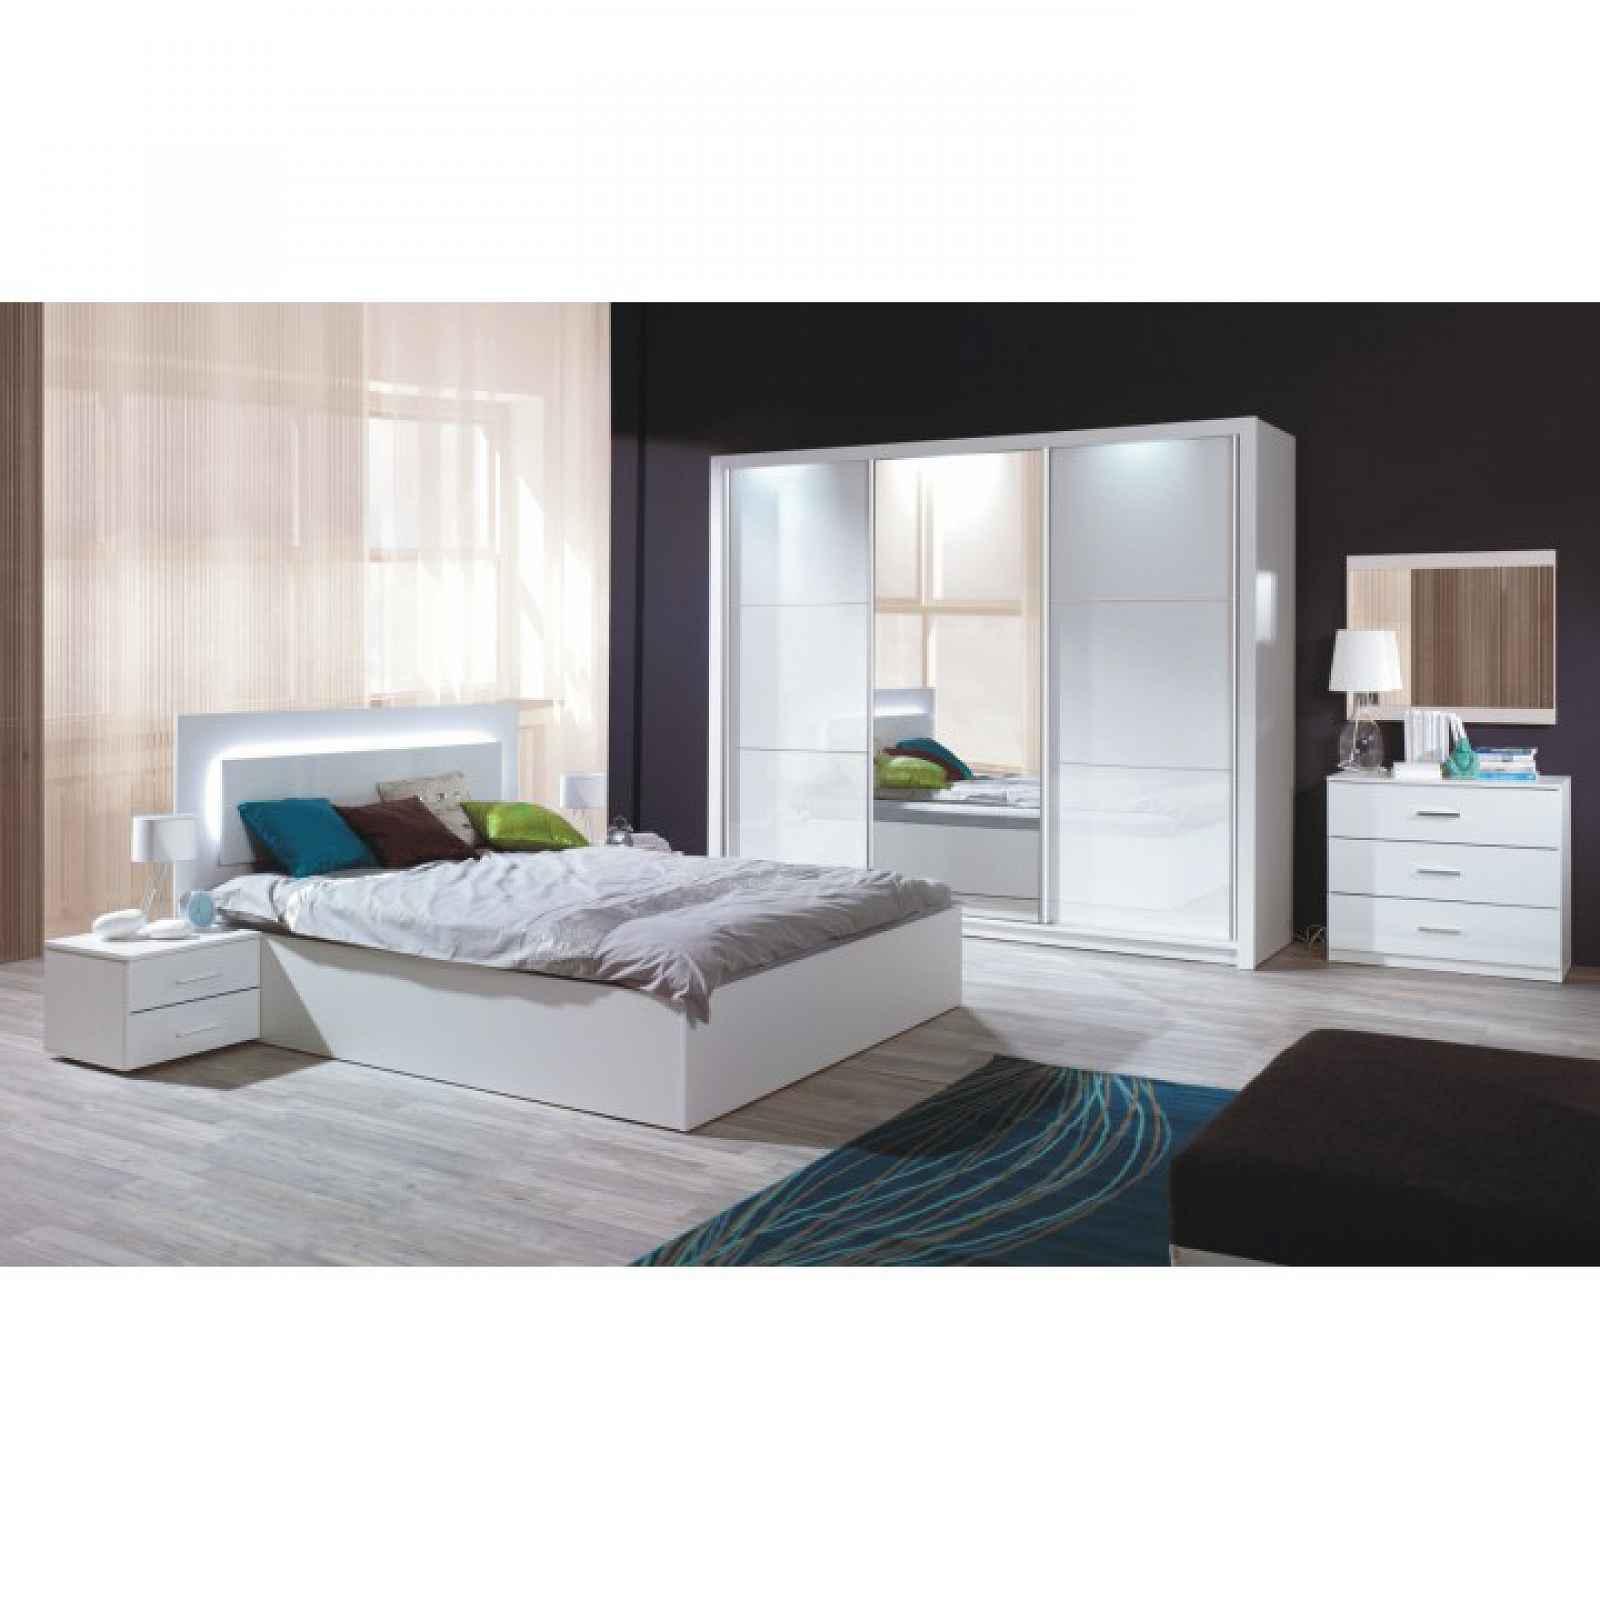 Ložnicový komplet (skříň+postel 160x200+2 x noční stolek), bílá / vysoký bílý lesk HG, ASIENA 0000210561 Tempo Kondela